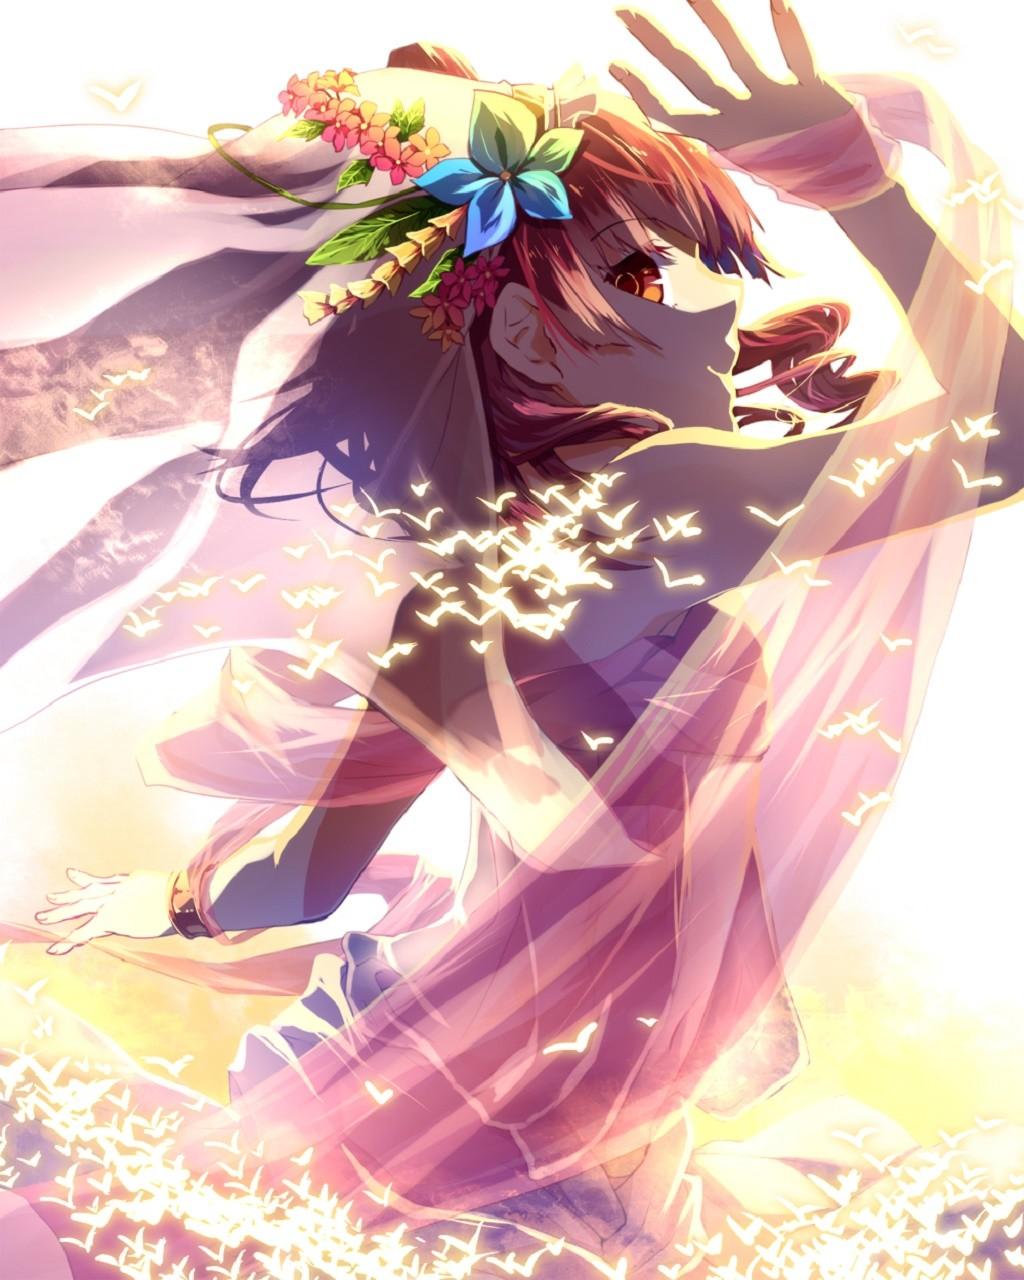 Wallpaper Illustration Anime Dancer Magi The Labyrinth Of